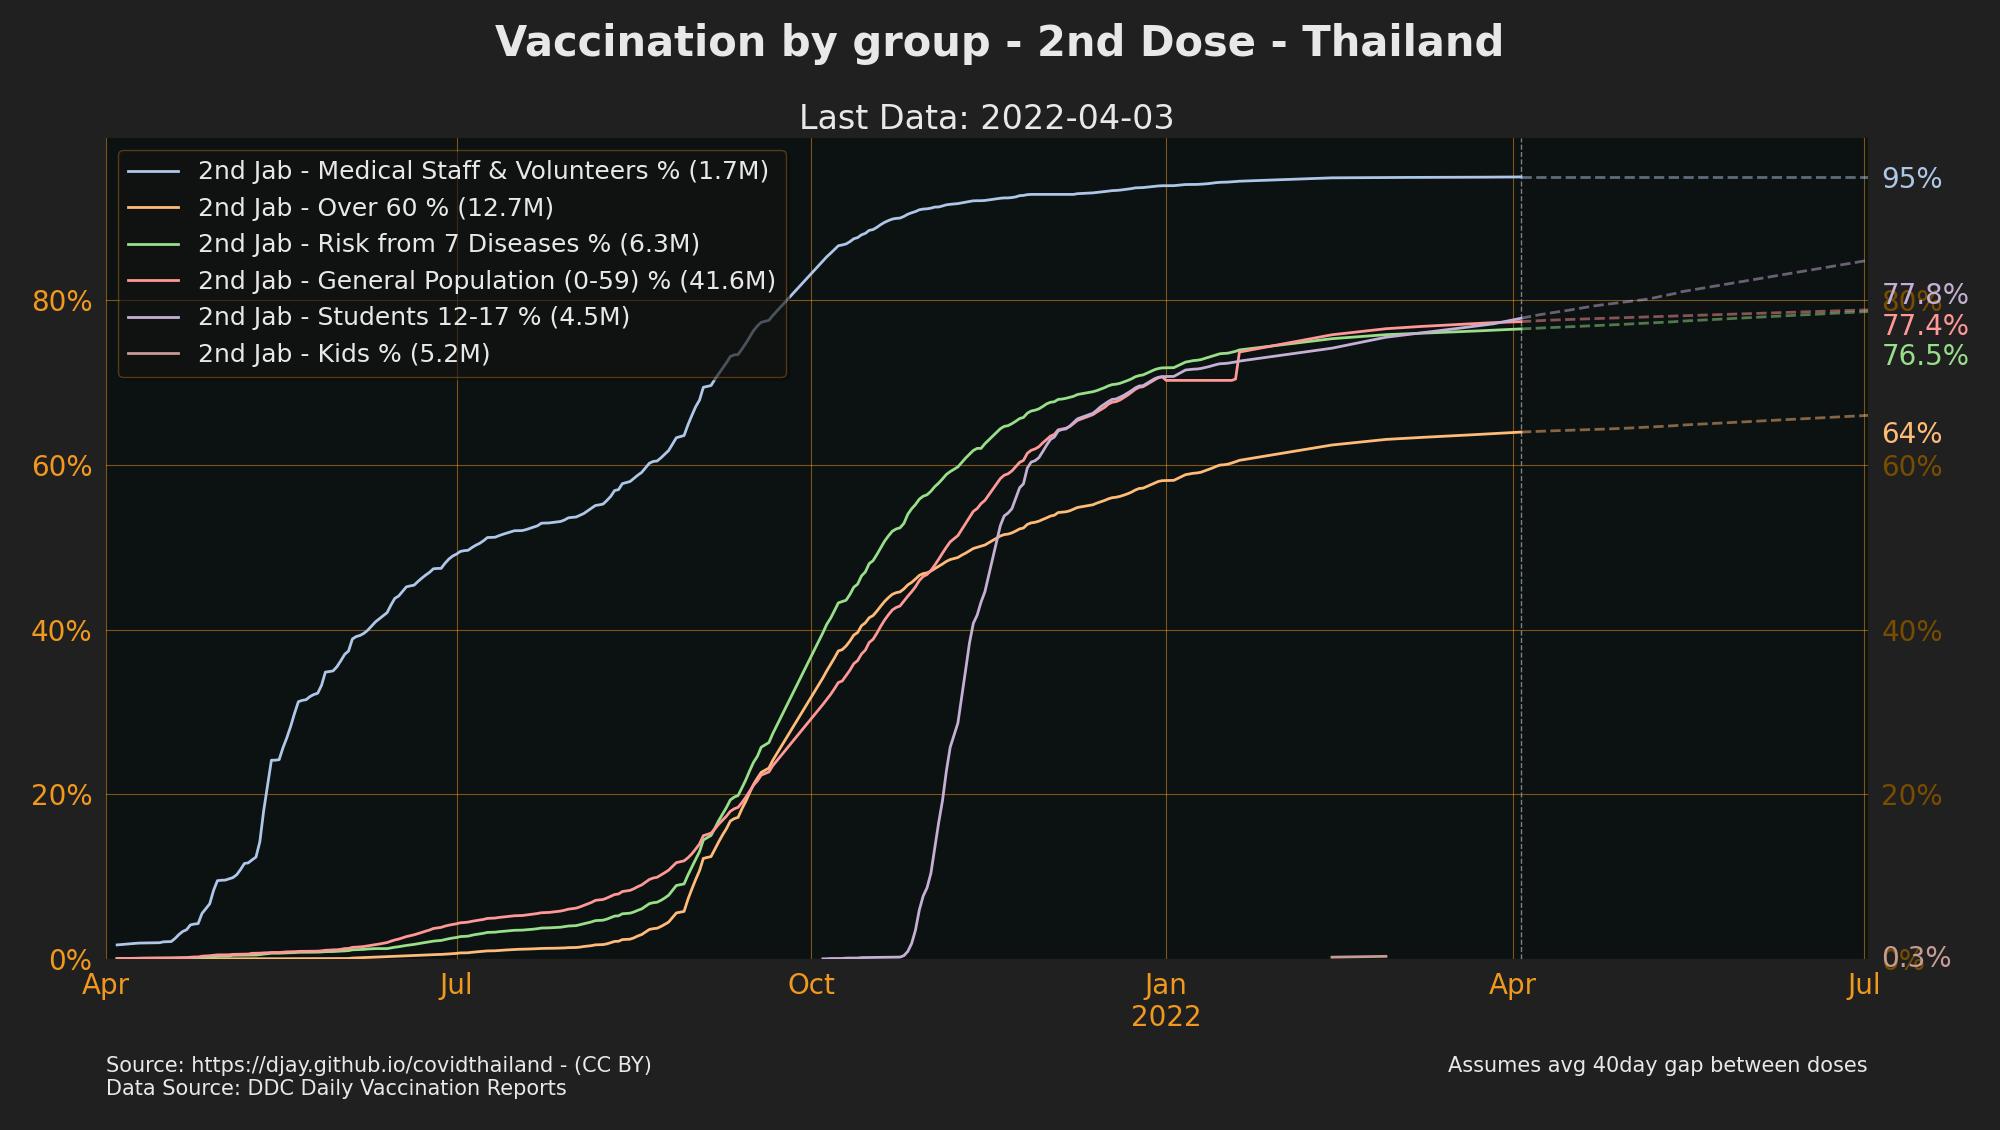 Progress towards Full Vaccination